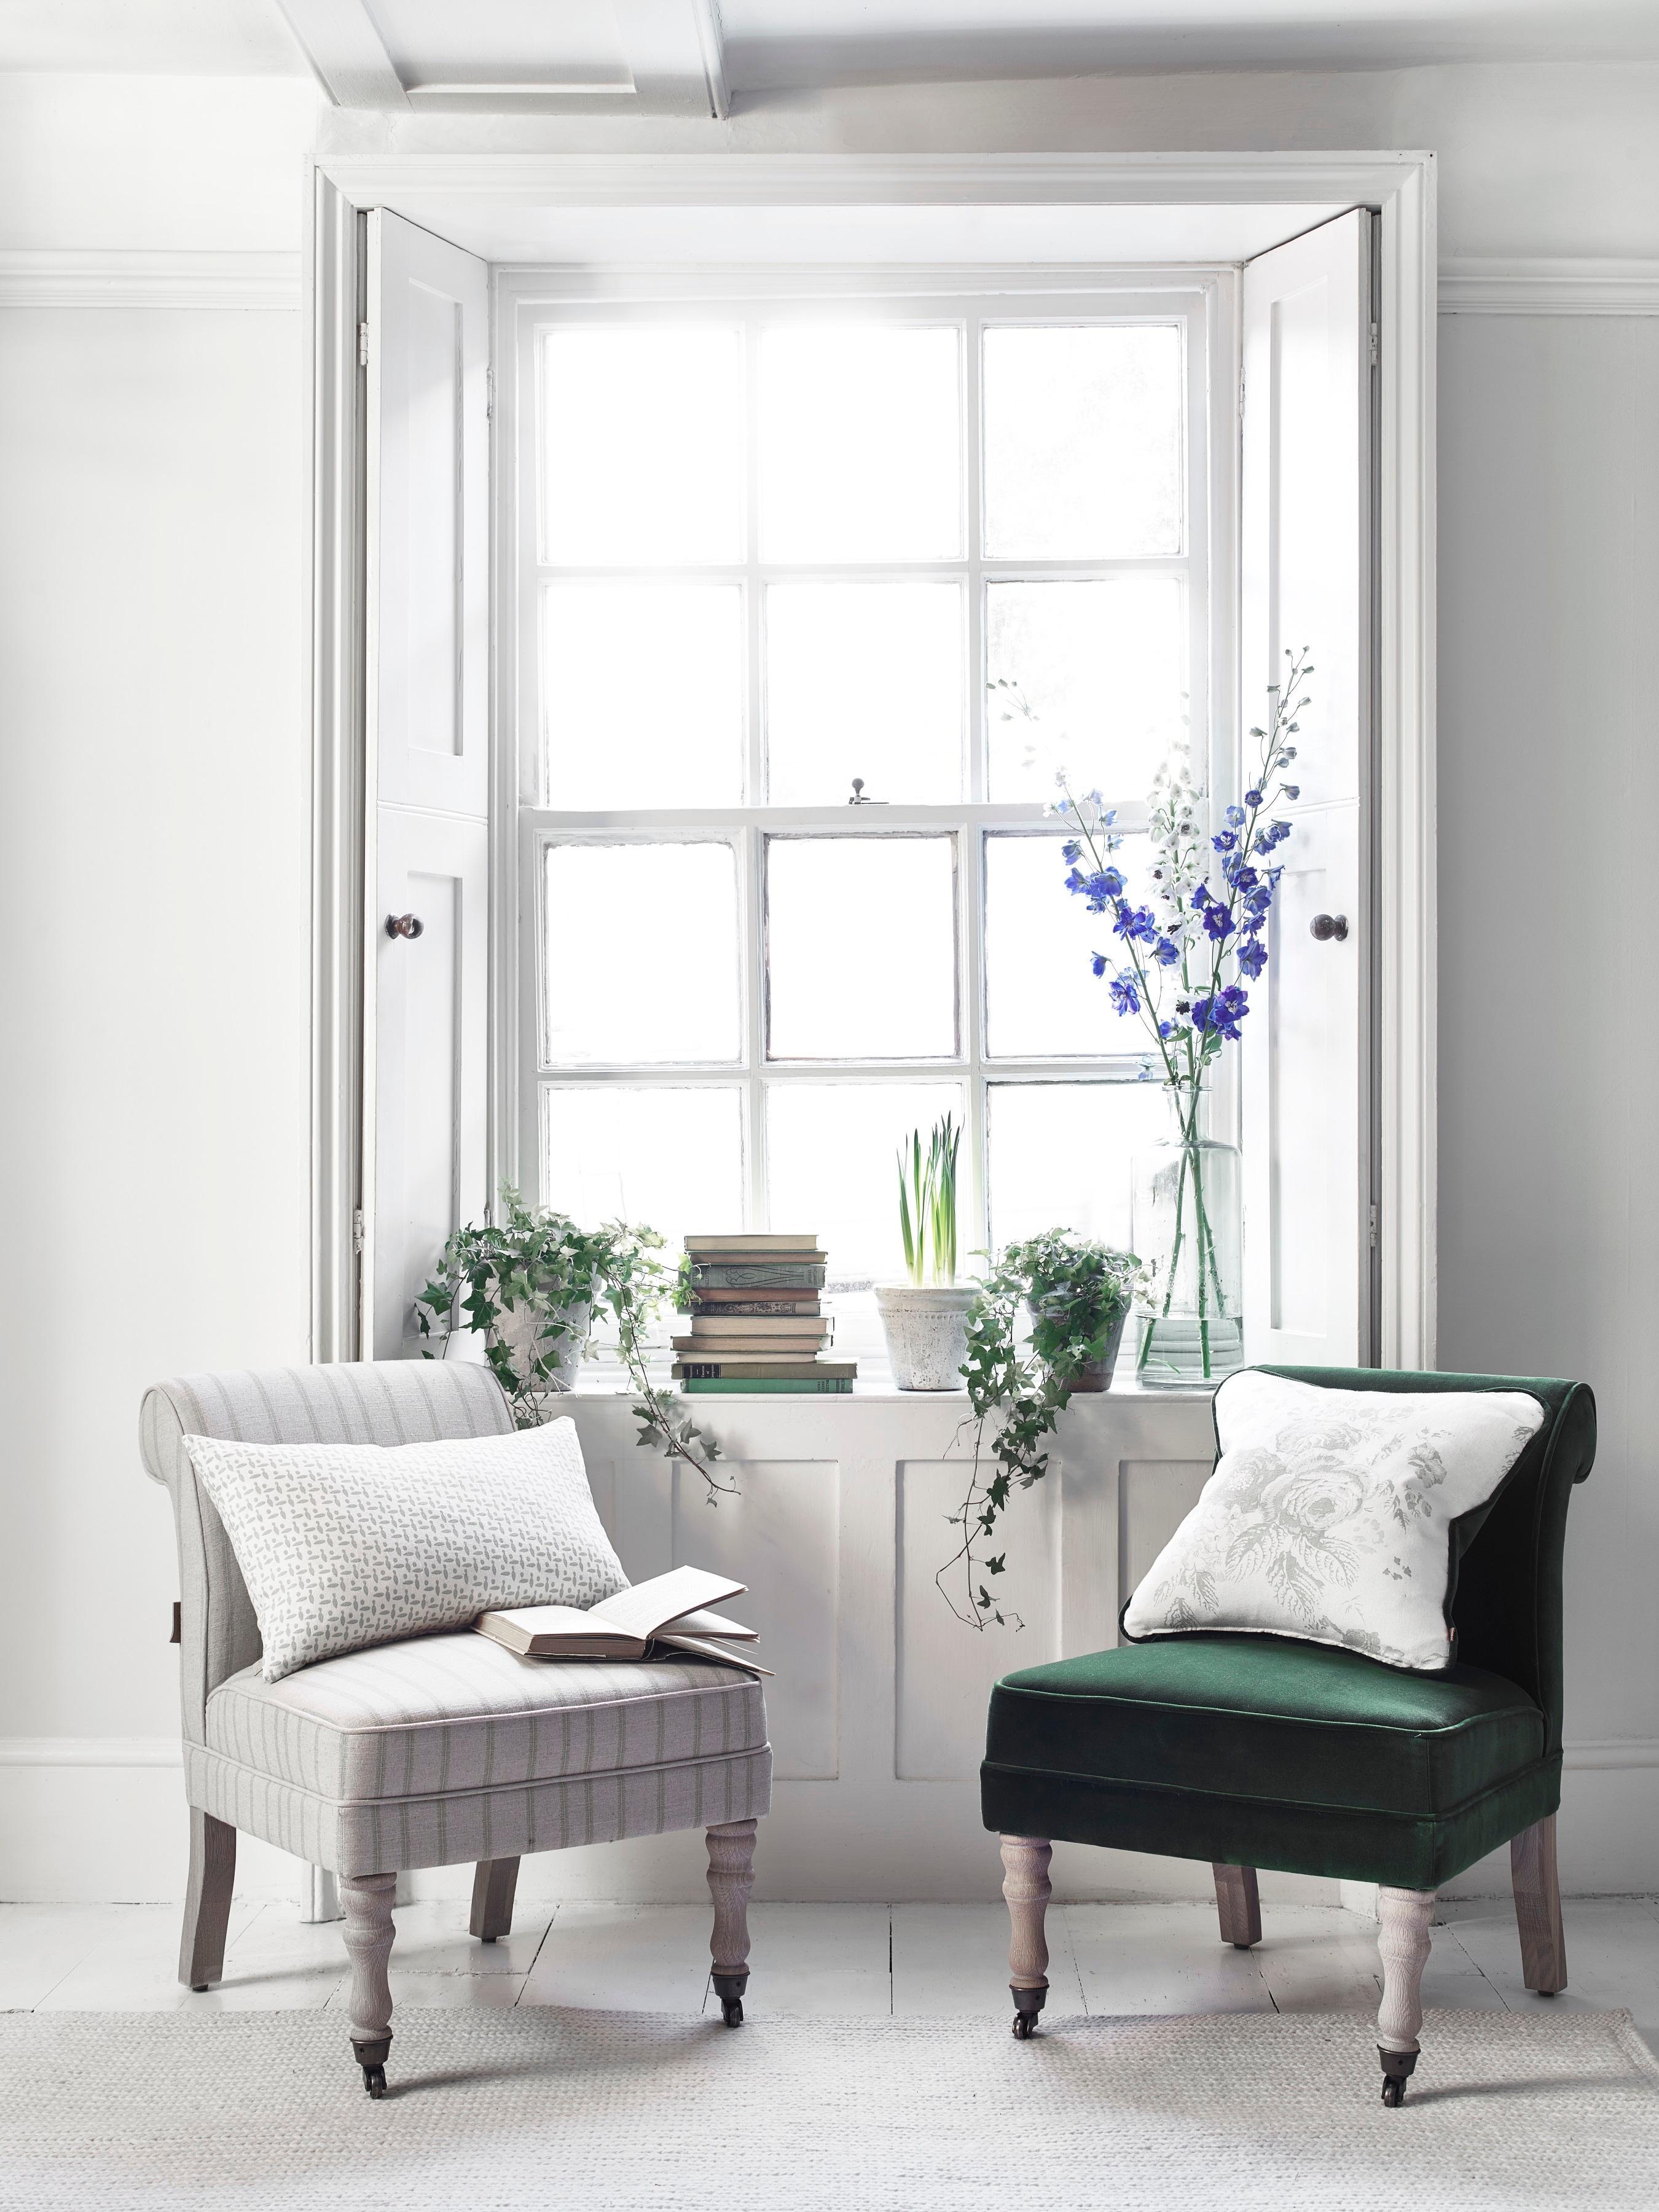 fensterrahmen bilder ideen couchstyle. Black Bedroom Furniture Sets. Home Design Ideas